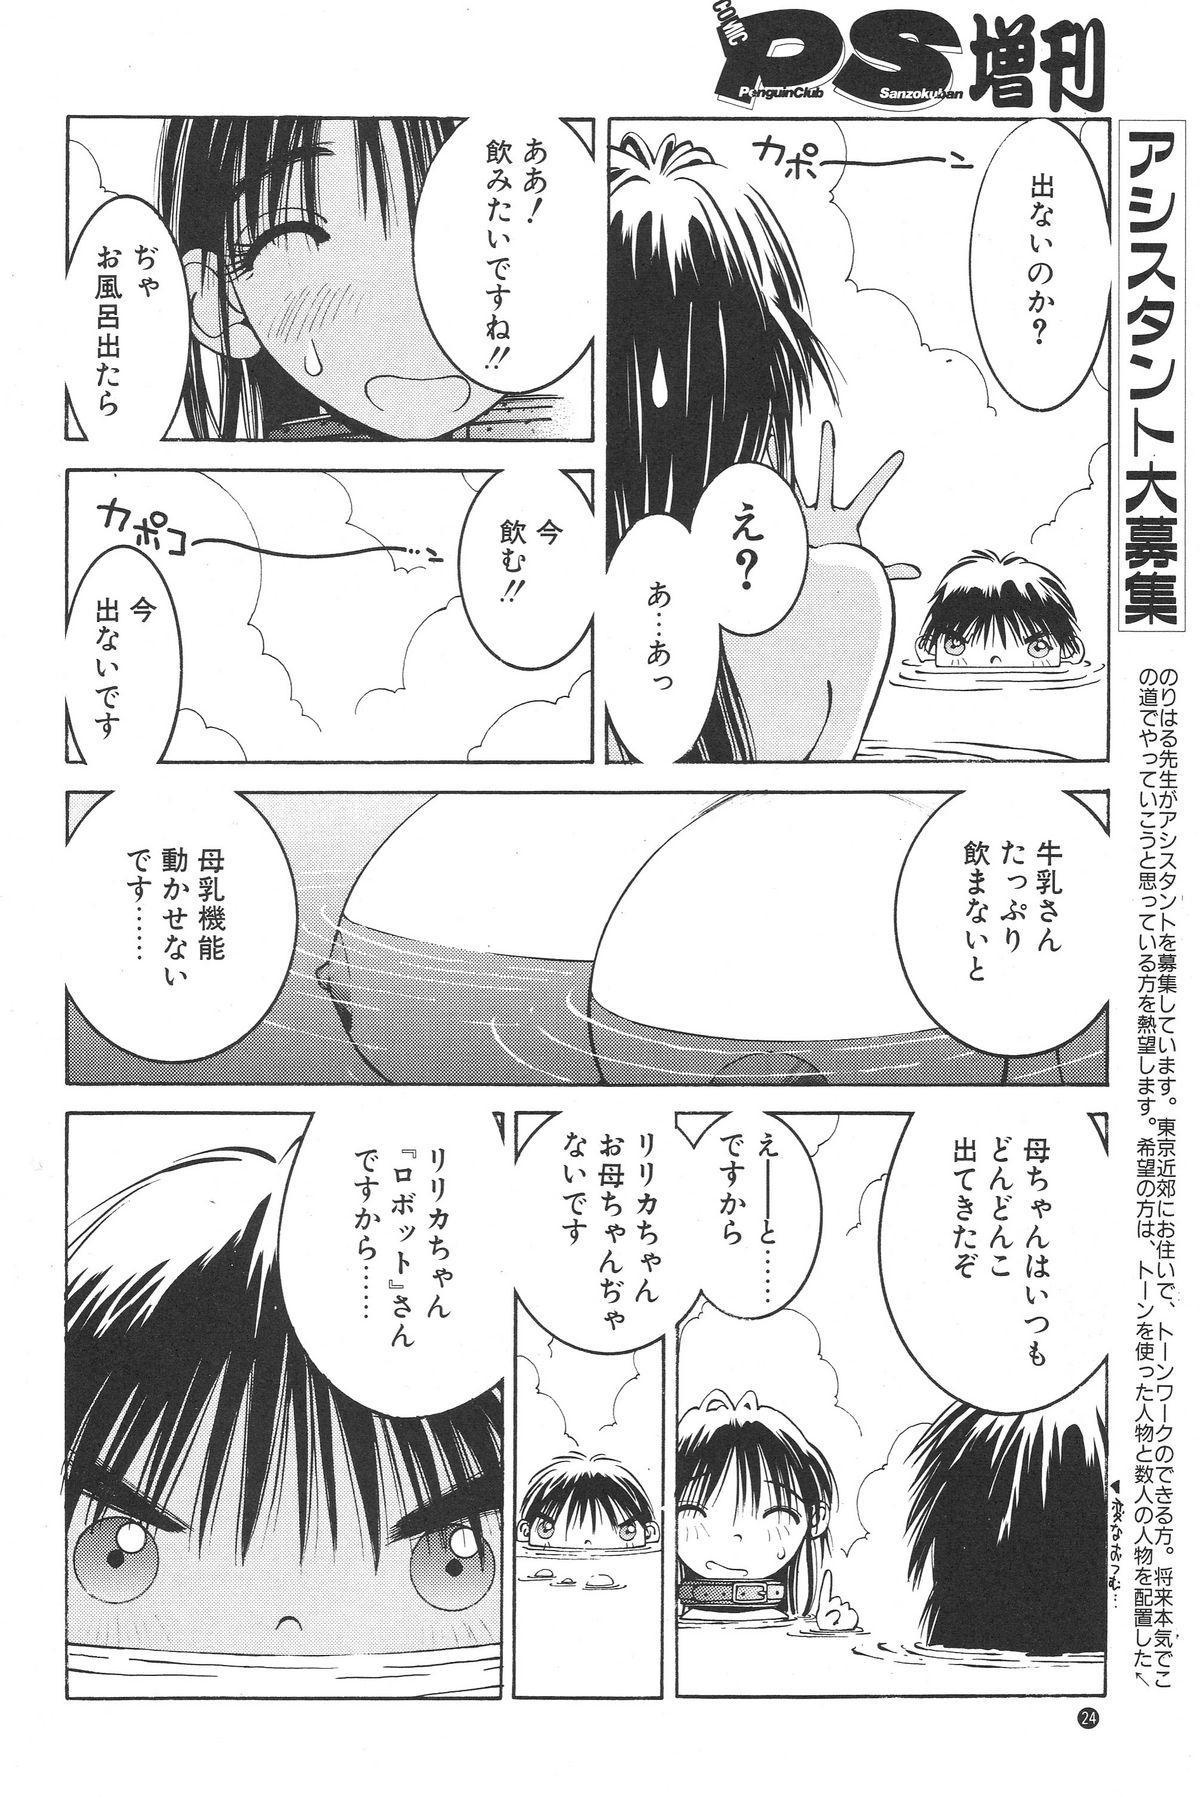 Nori-Haru 22